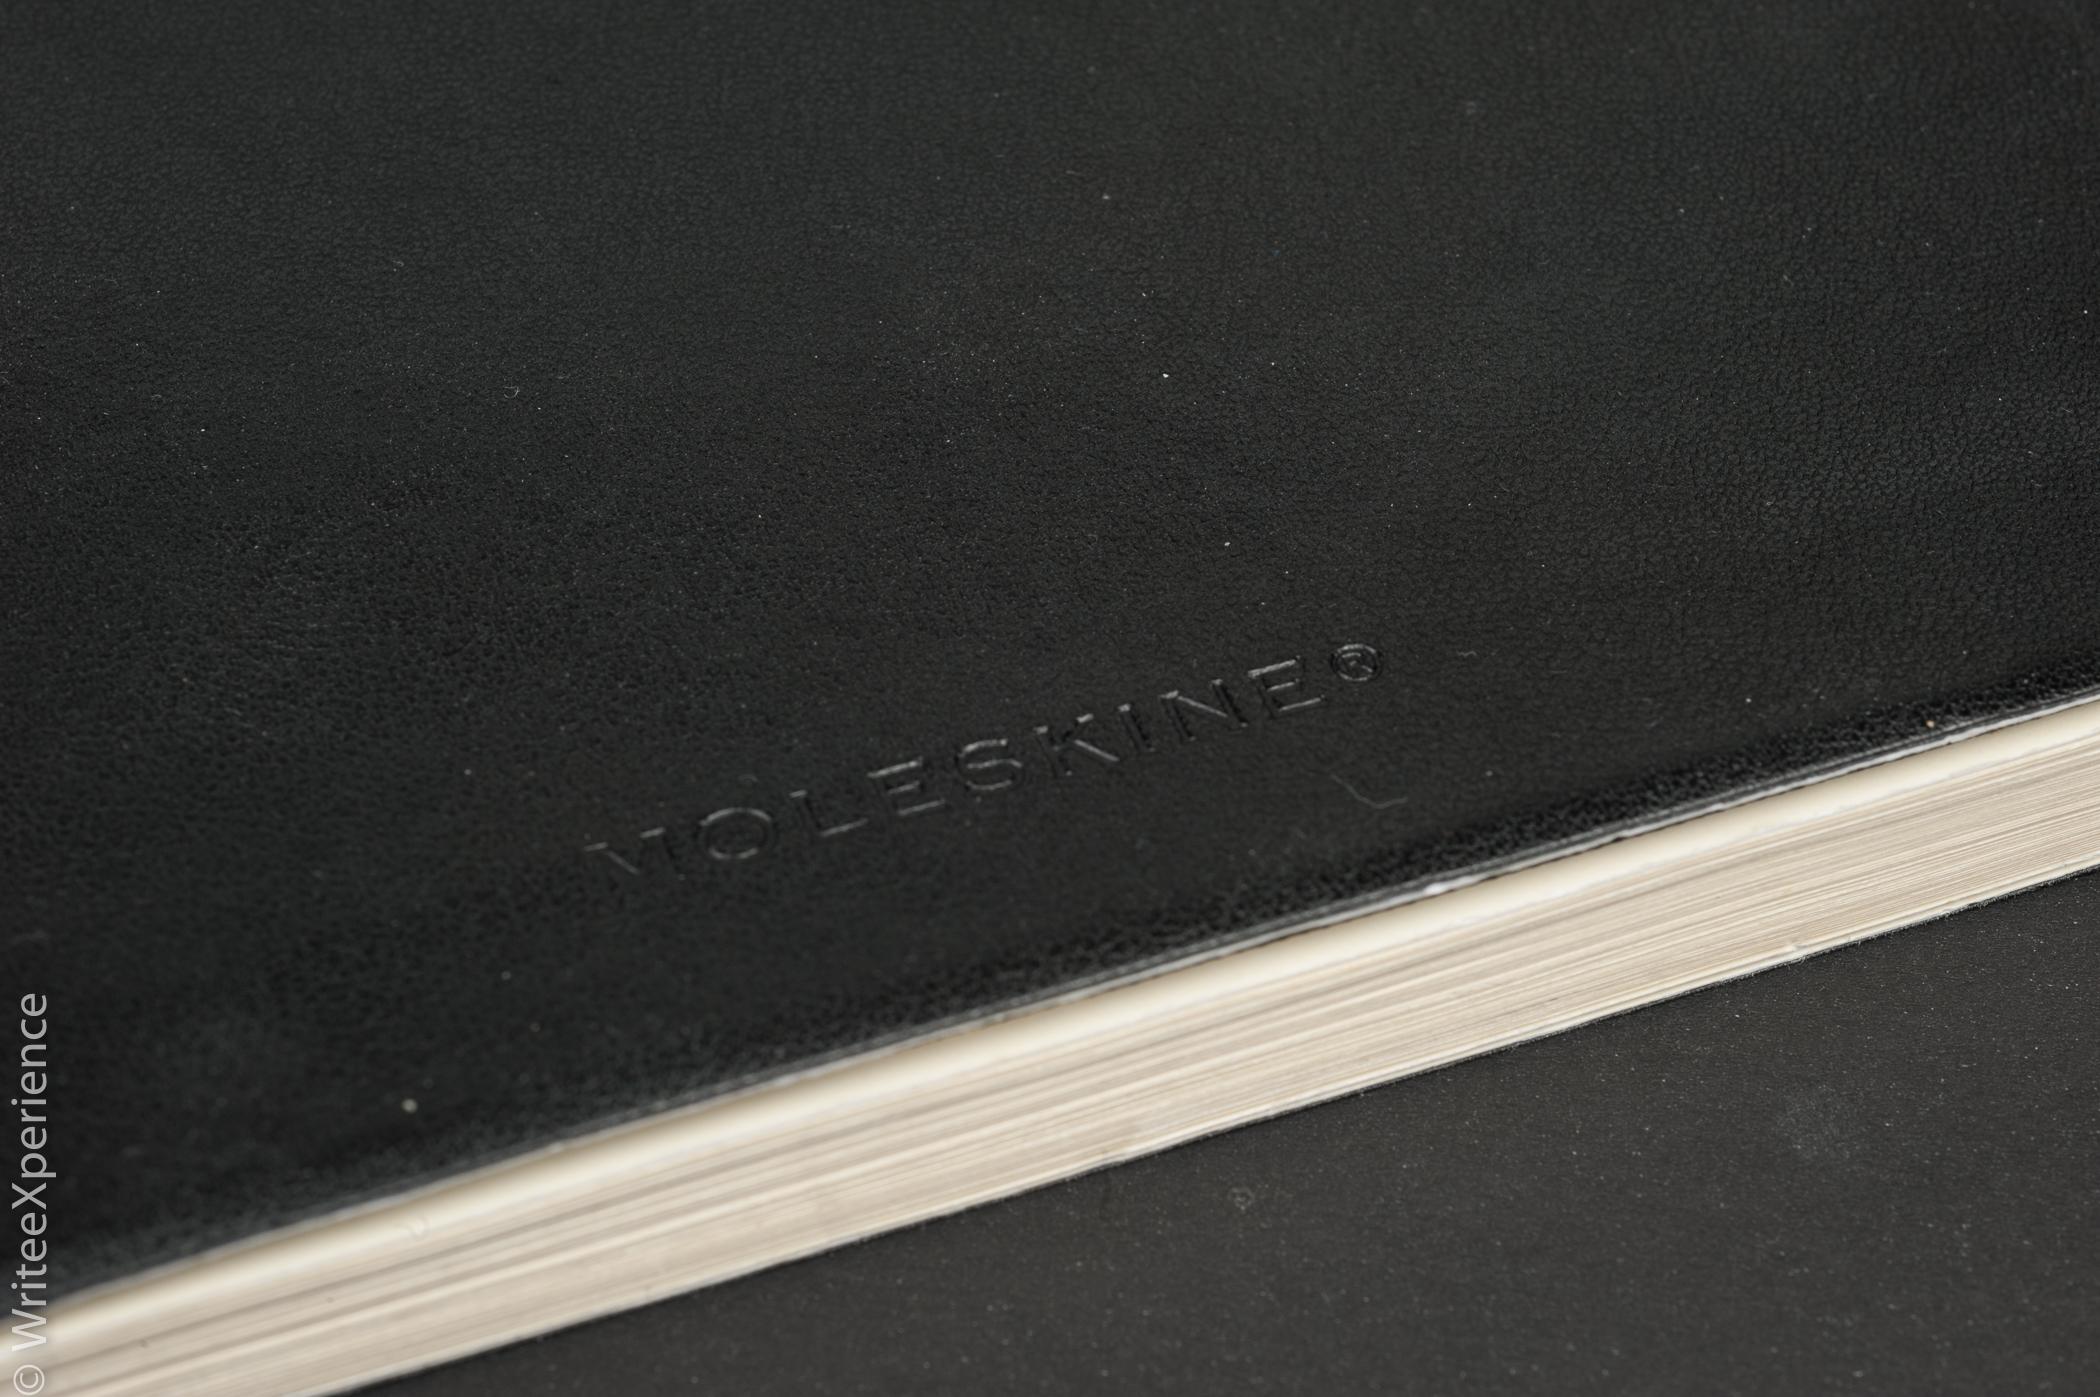 WriteeXperience-Moleskine-Classic-Notebook-3.jpg